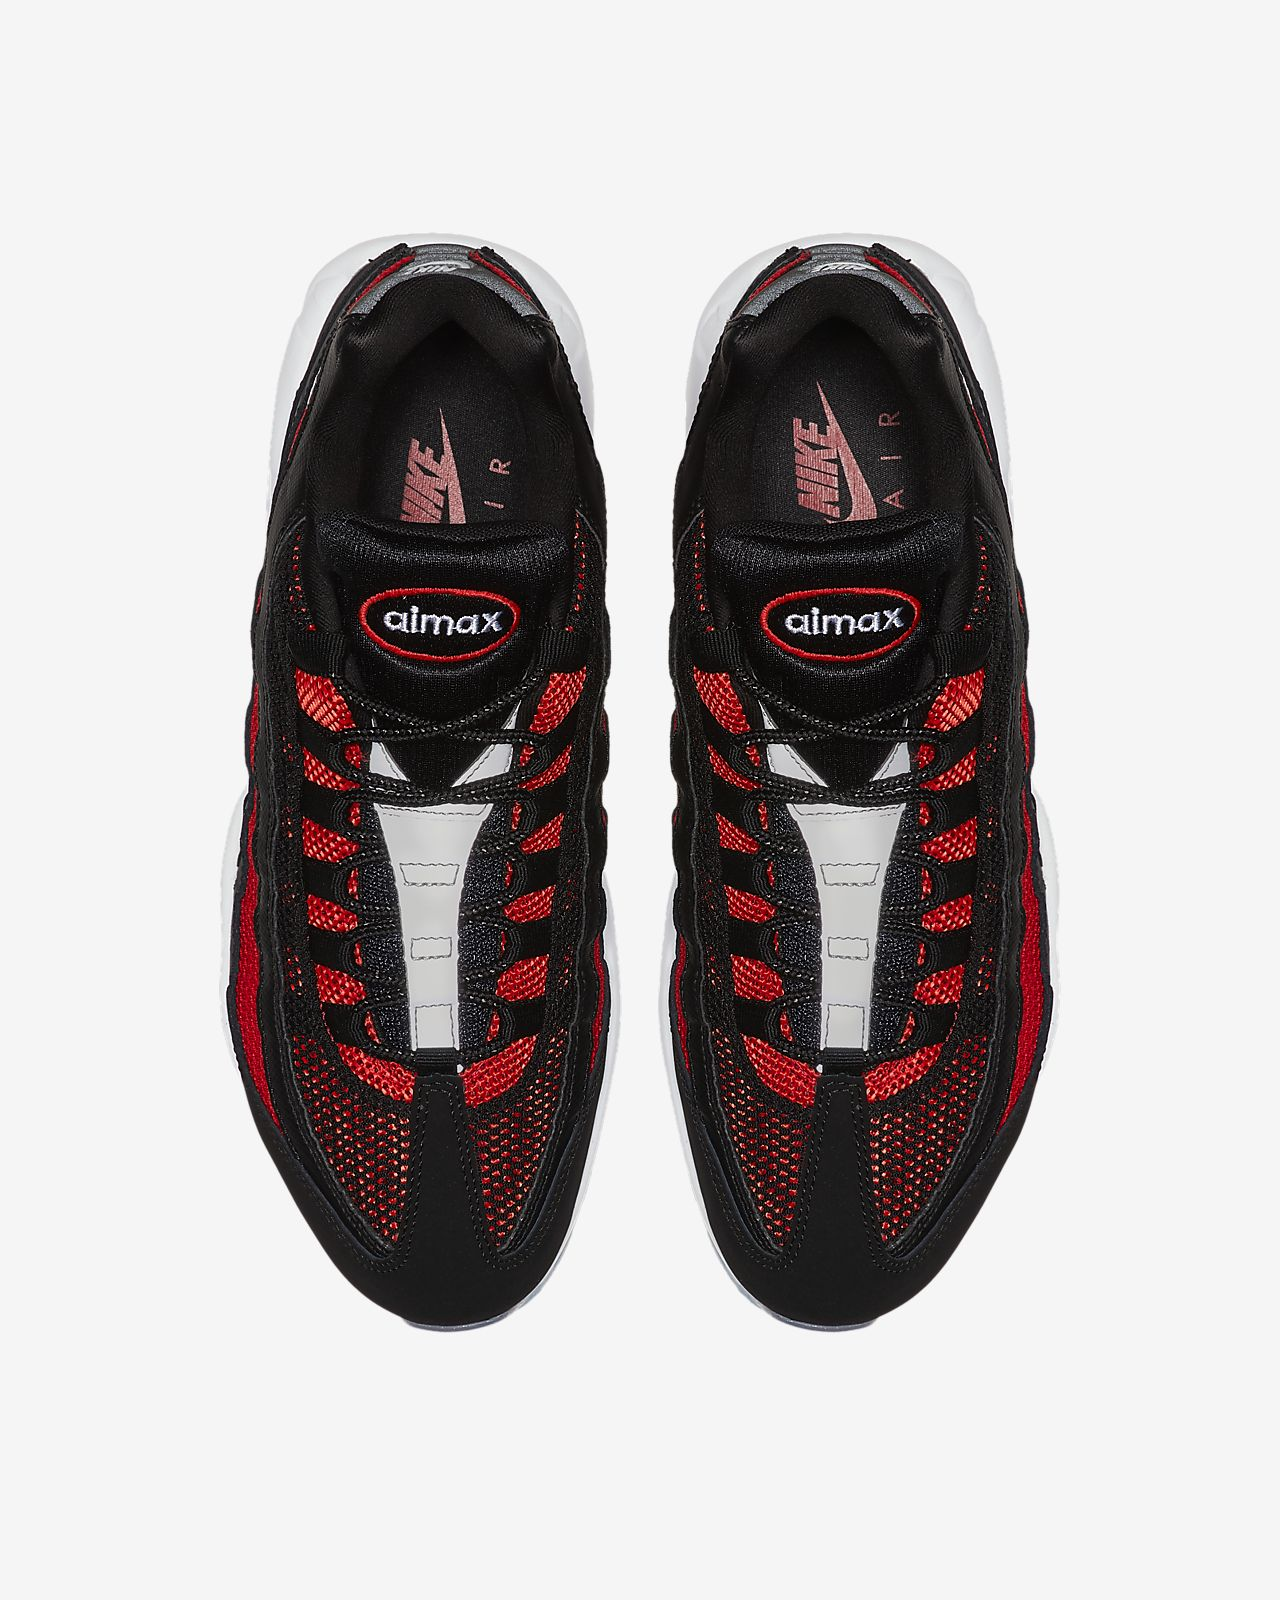 san francisco 4f4ef 14de4 Chaussure Nike Air Max 95 Essential pour Homme. Nike.com CA